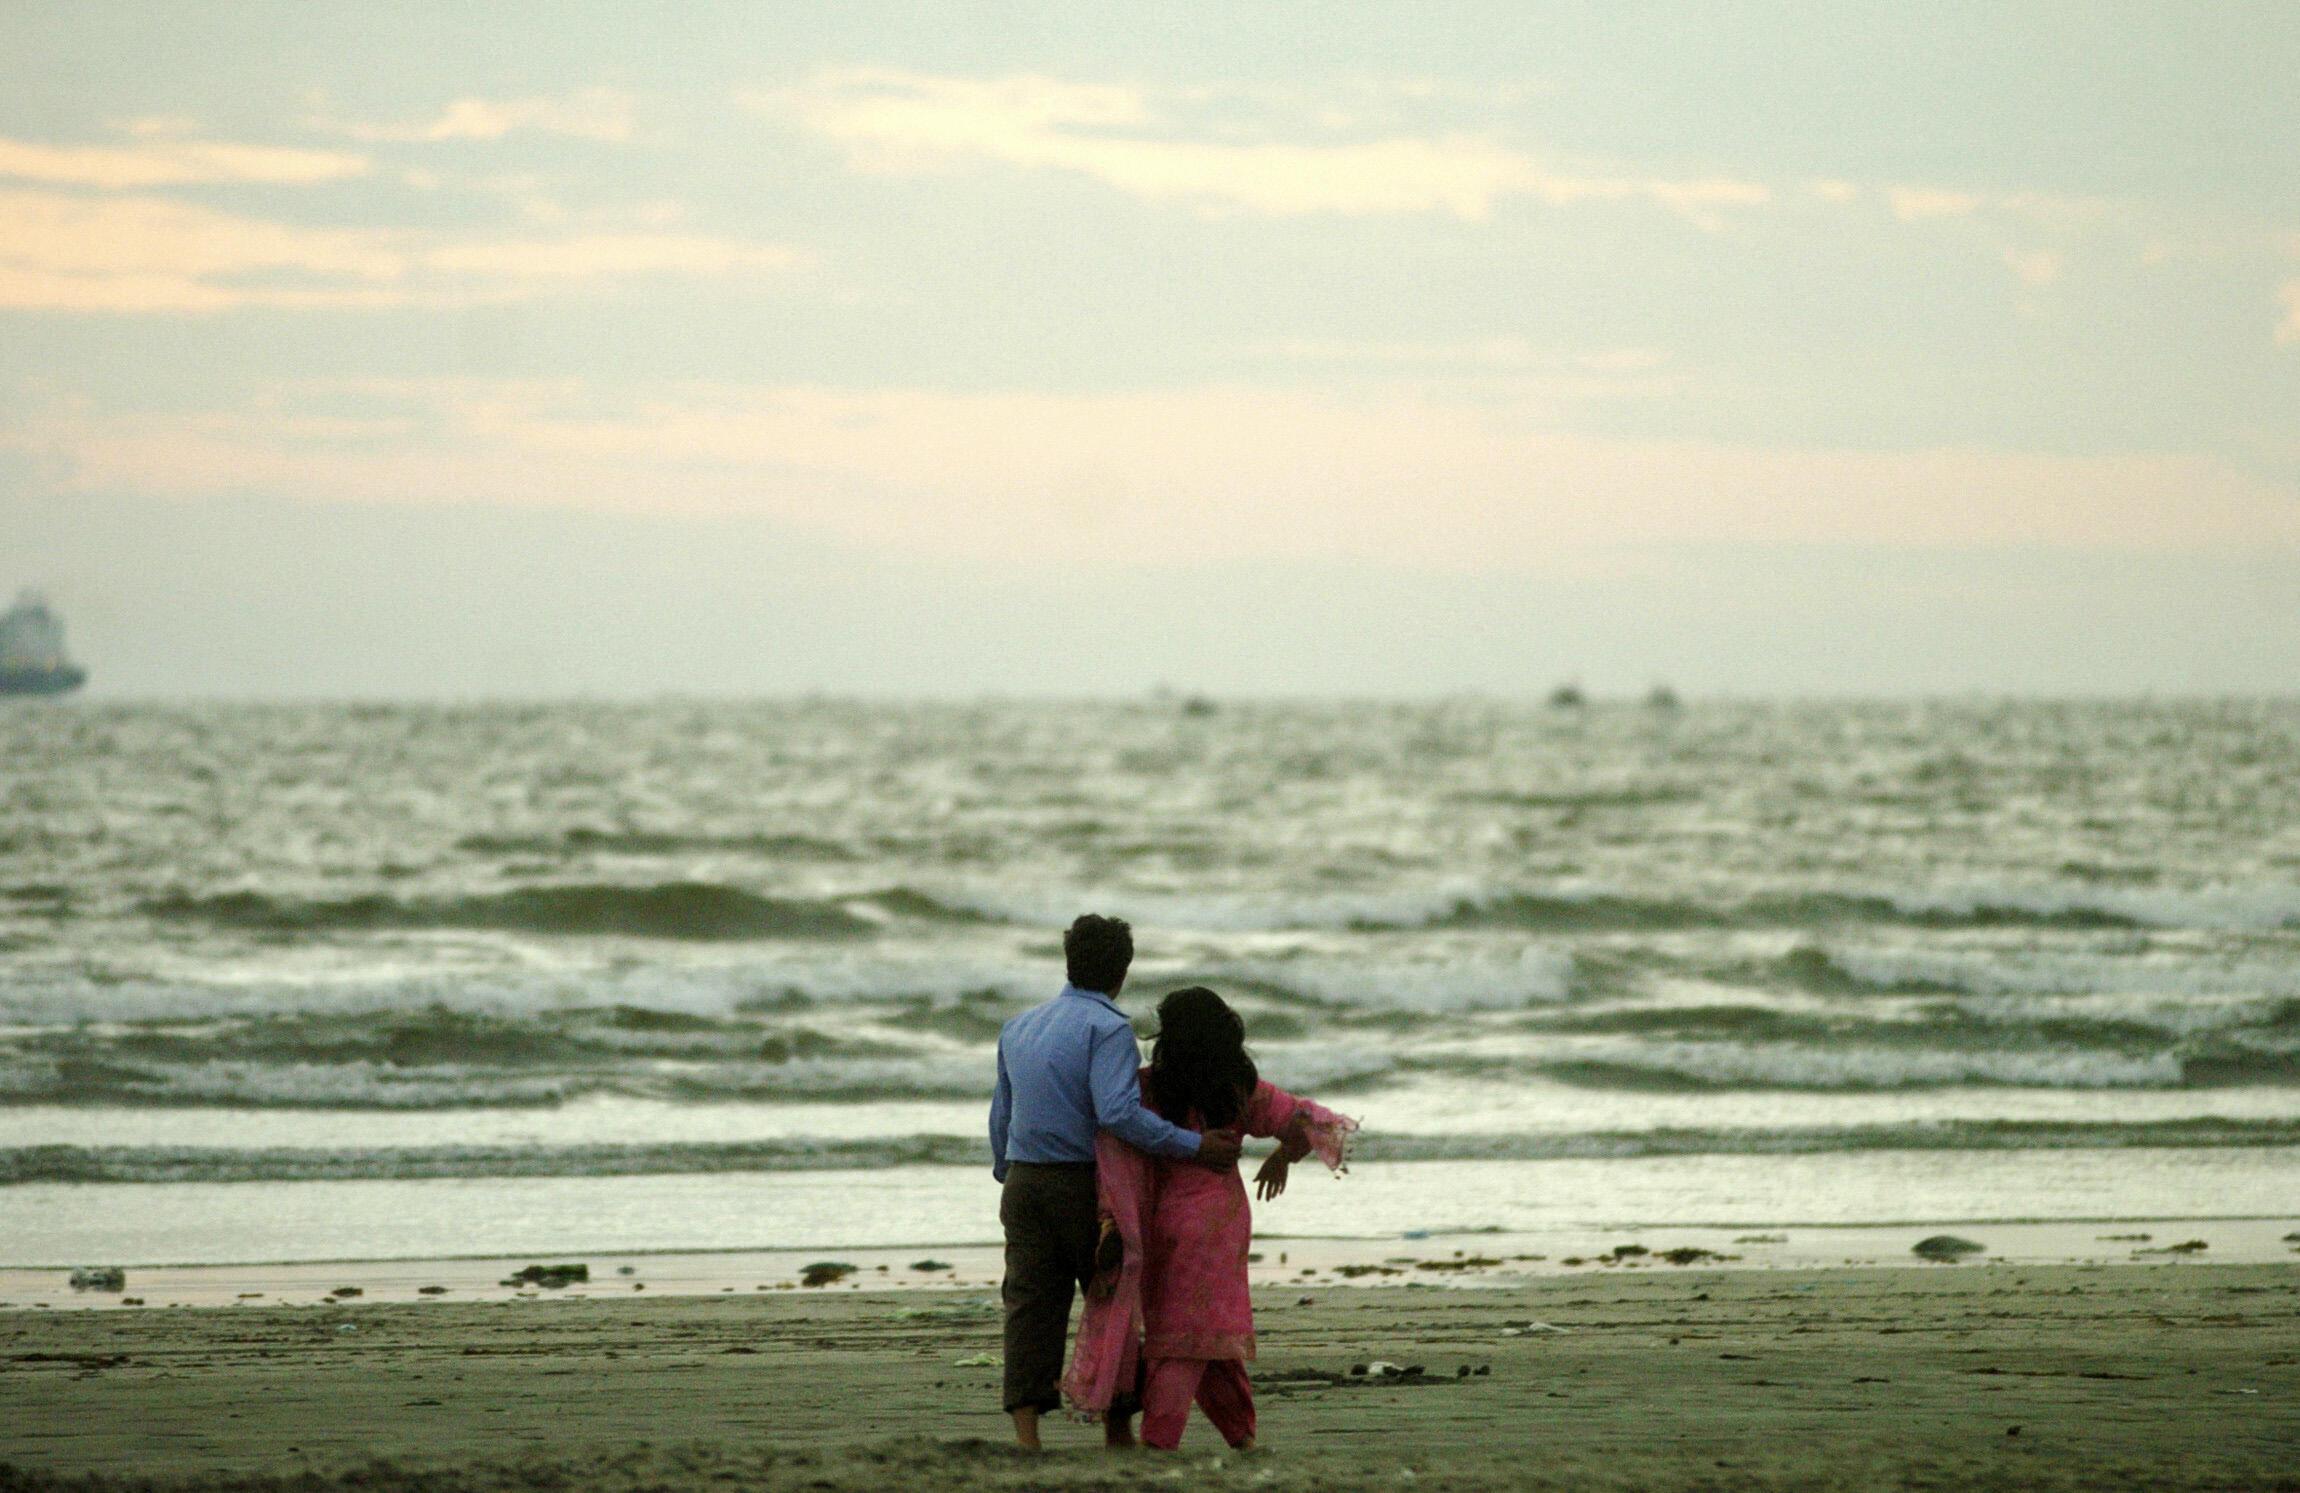 Image RFI Archive - Pakistan couple amour